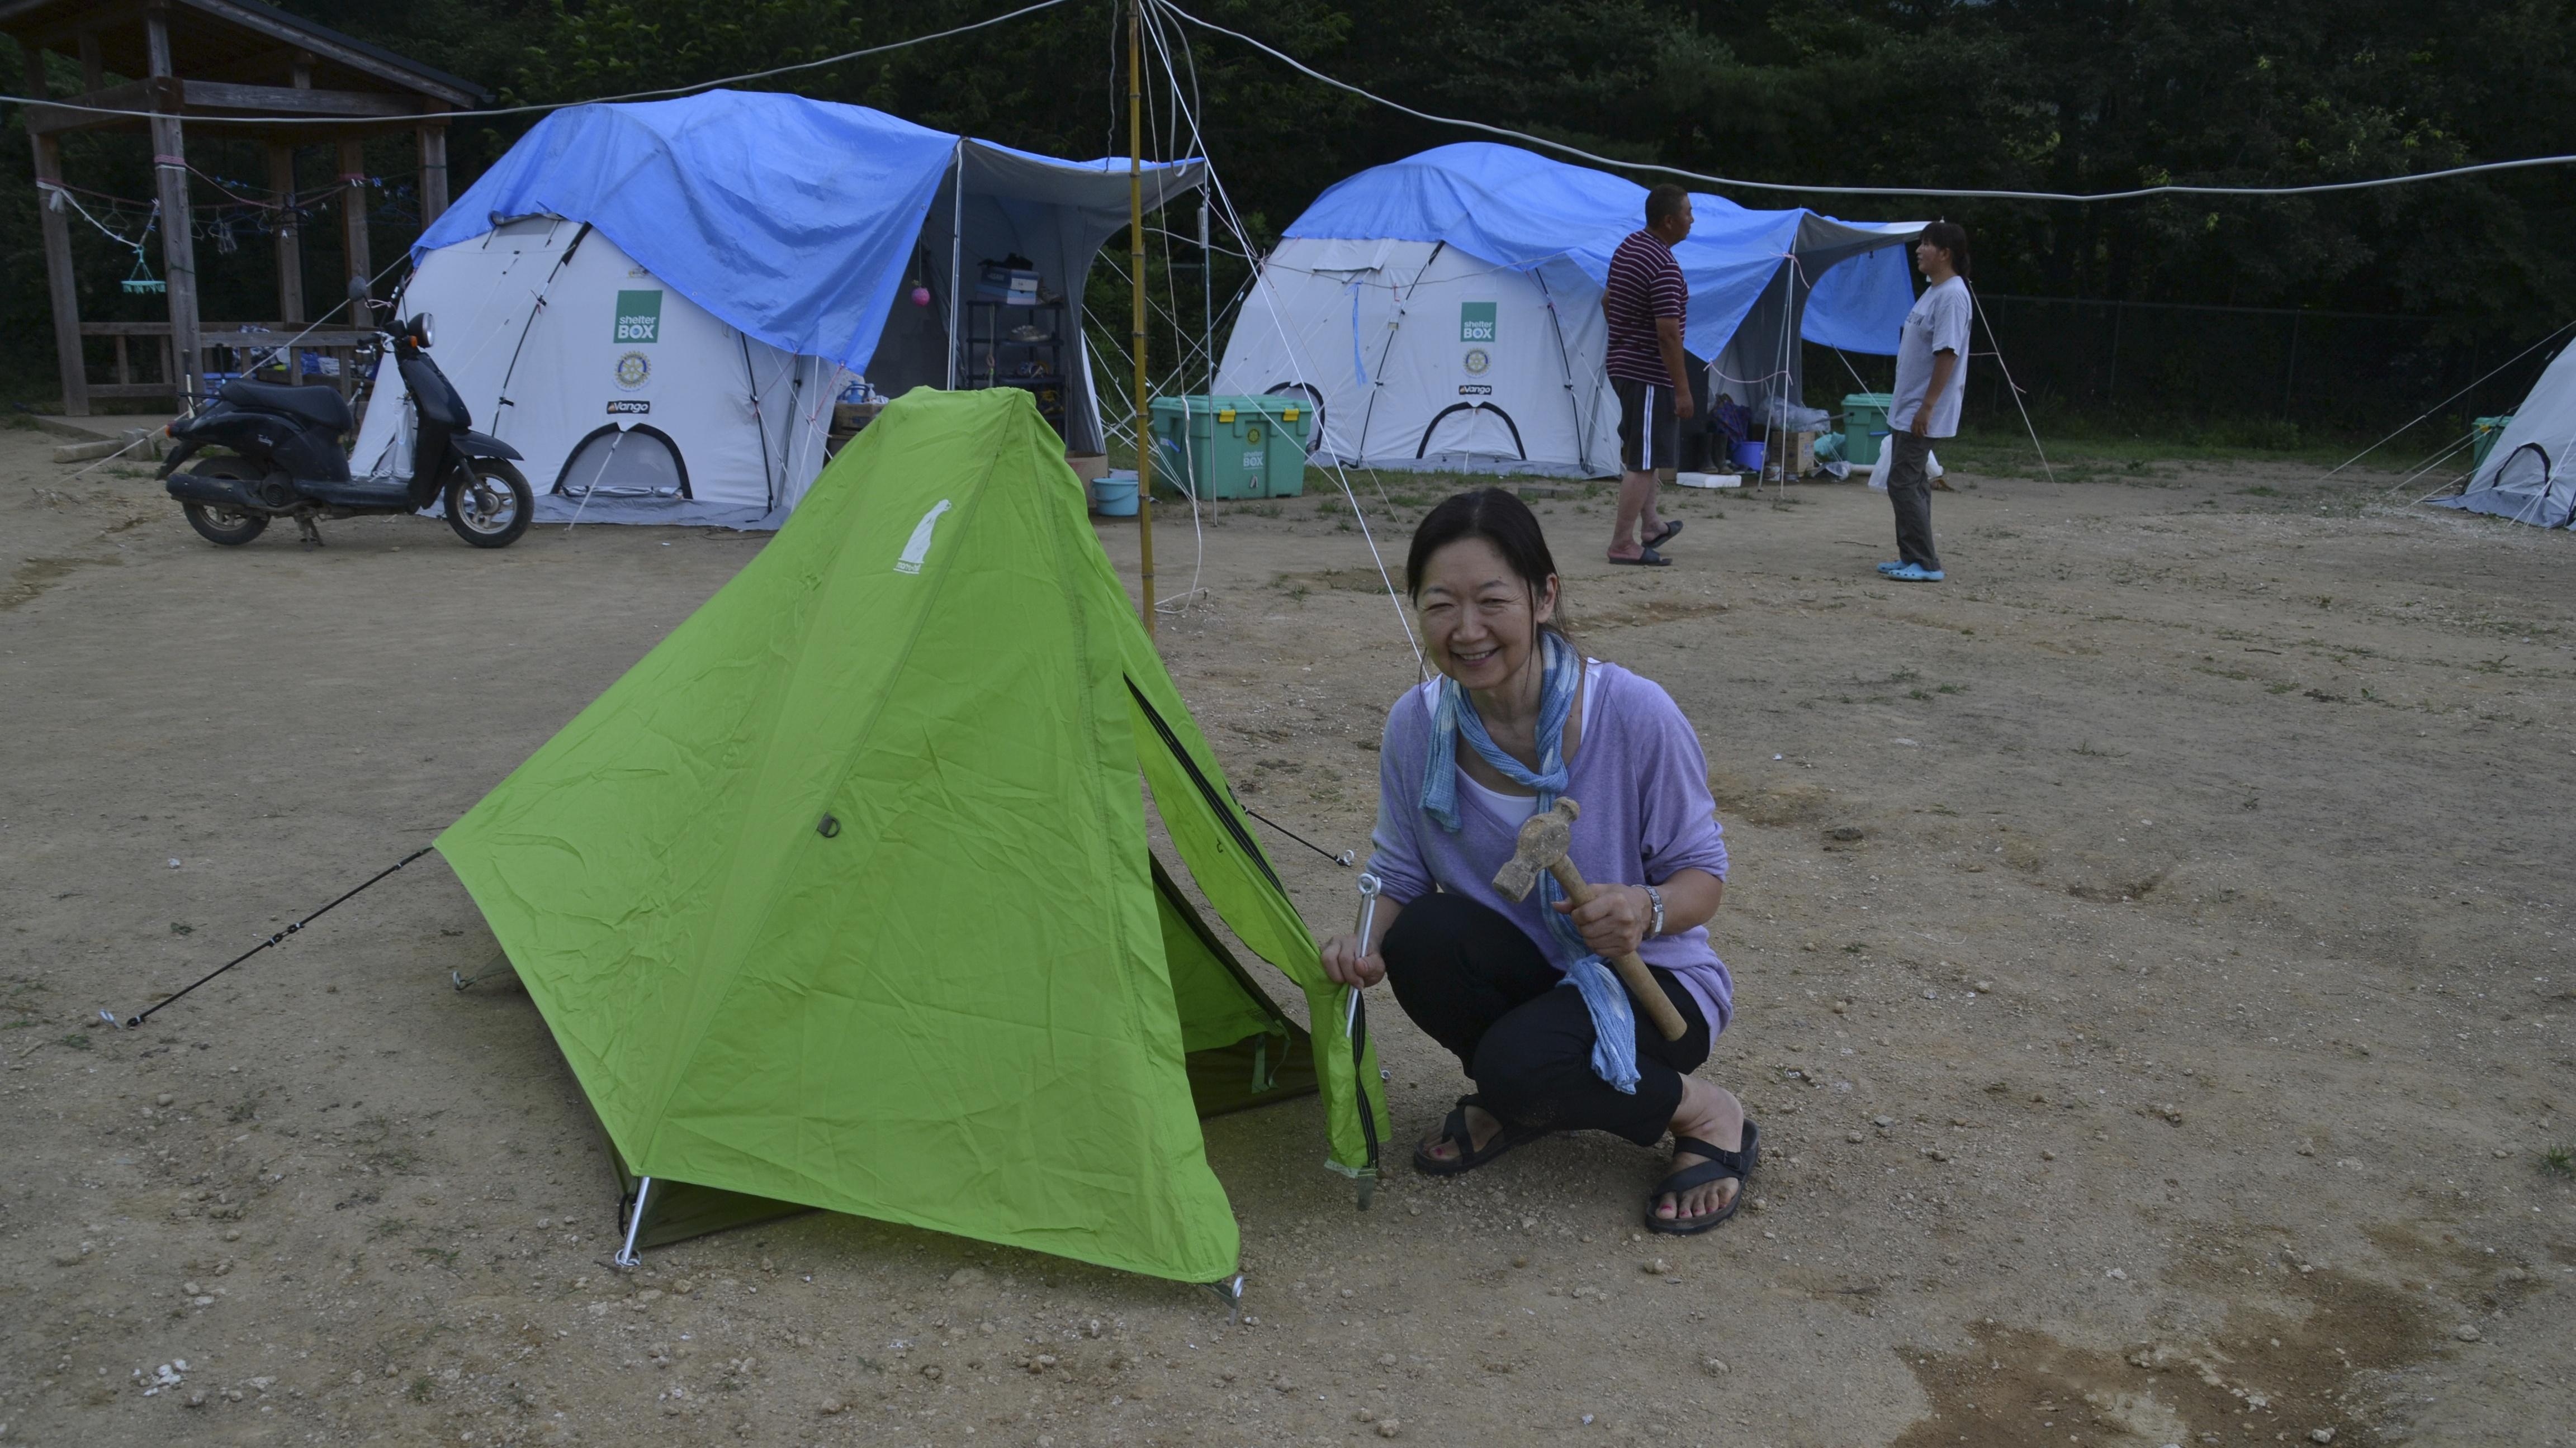 onagawa tent refugee center, linda and pup tent.JPG